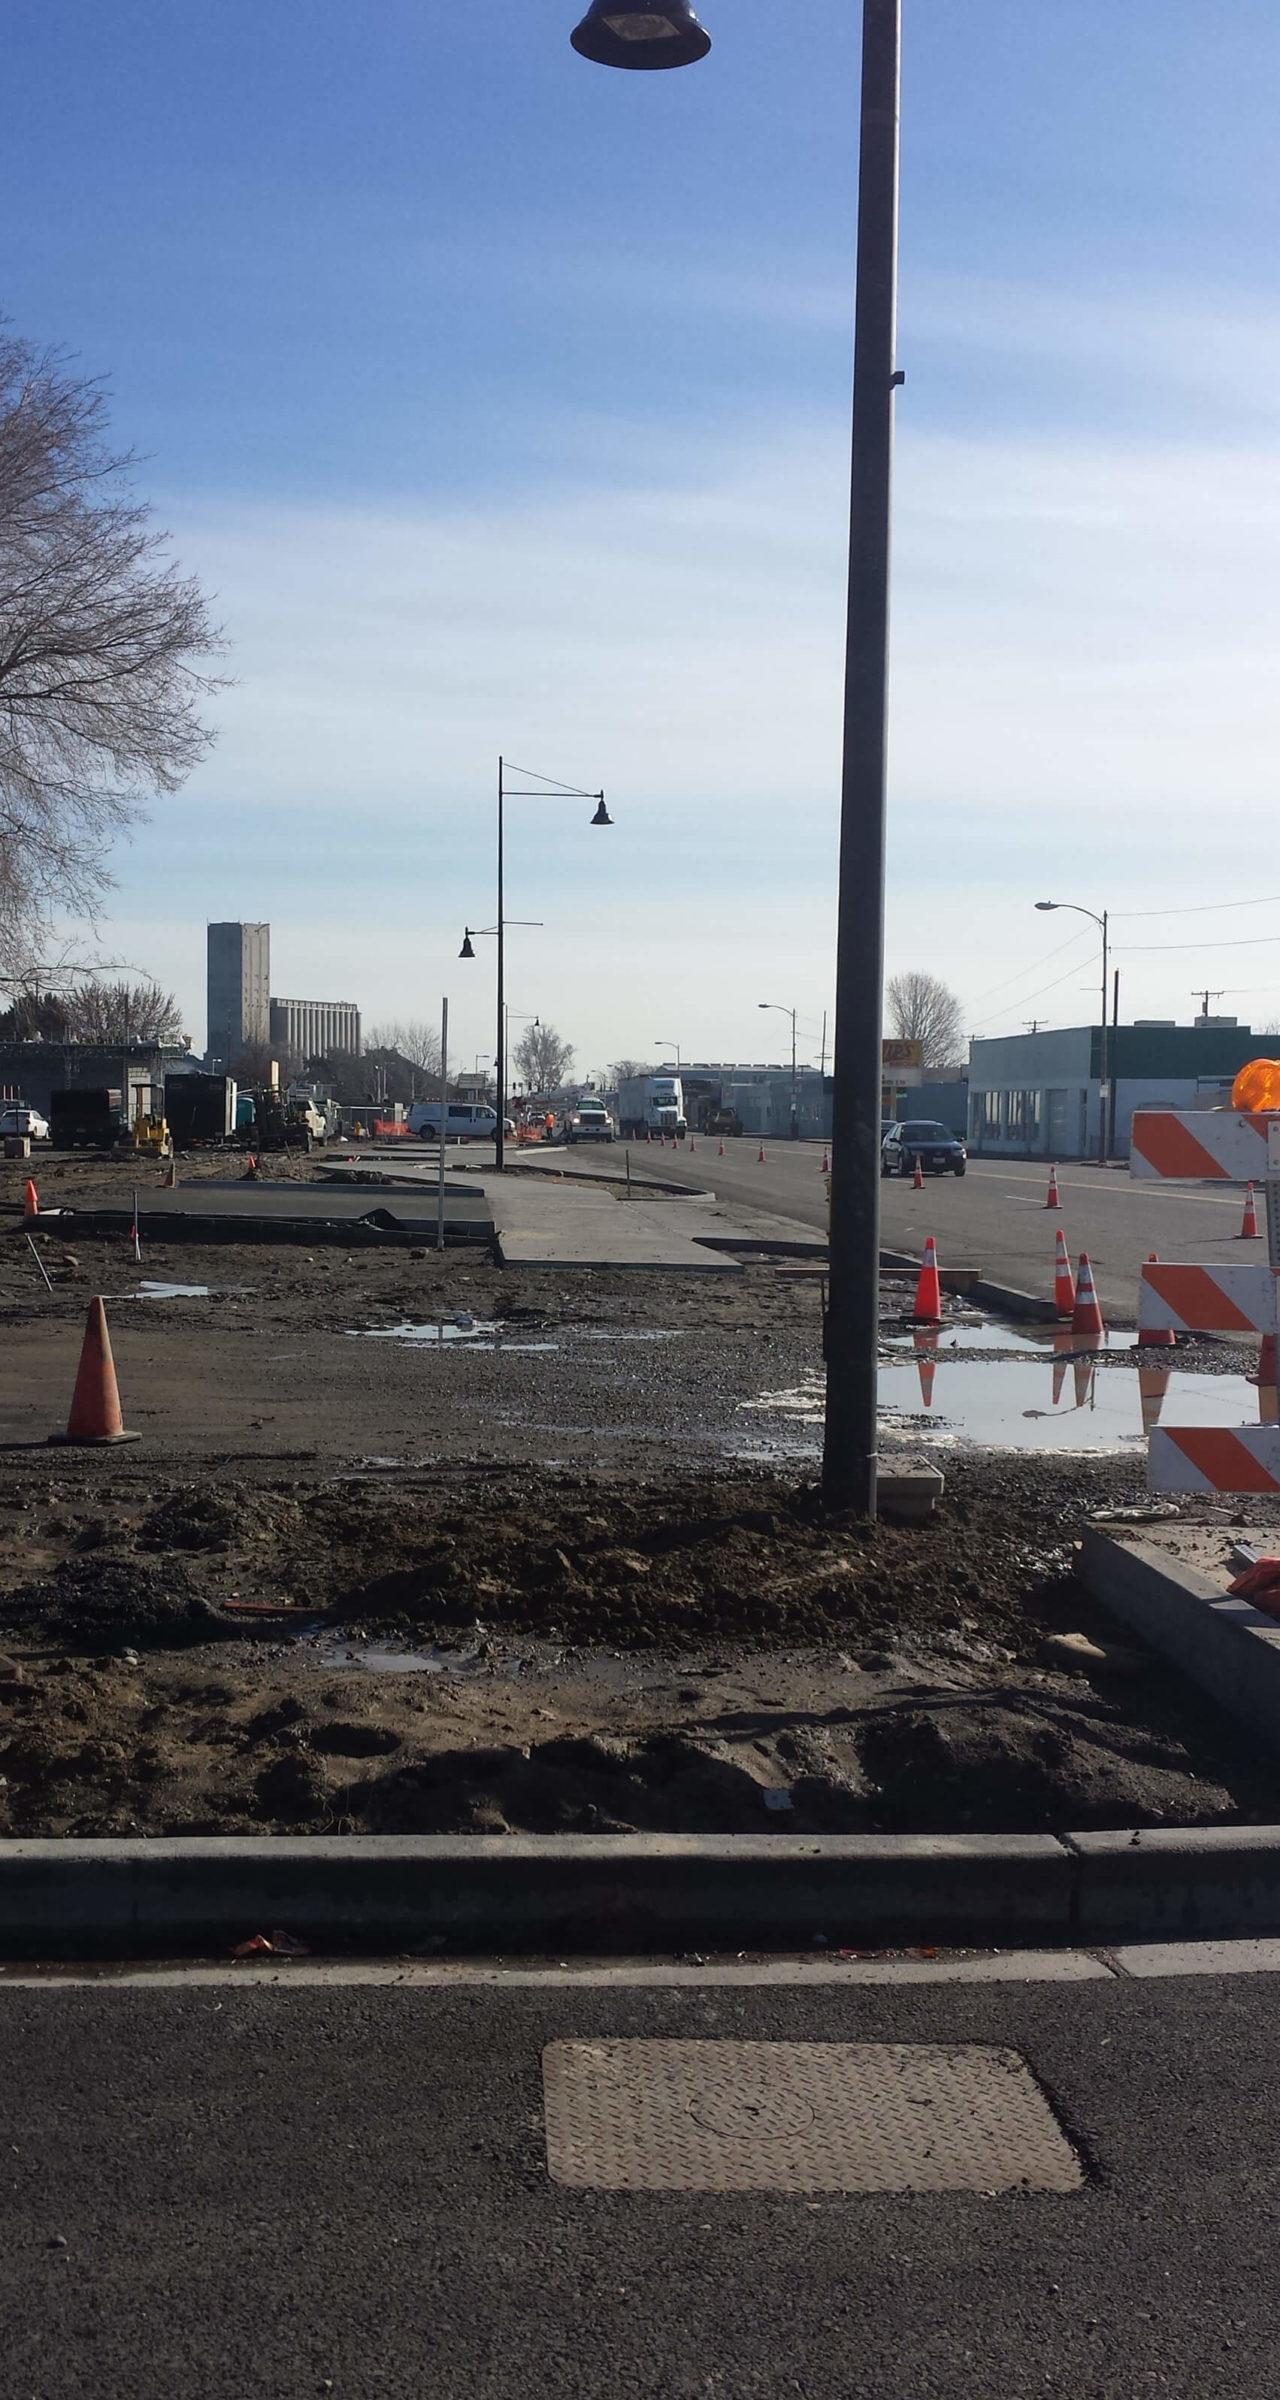 Constructing sidewalks and installing light poles.